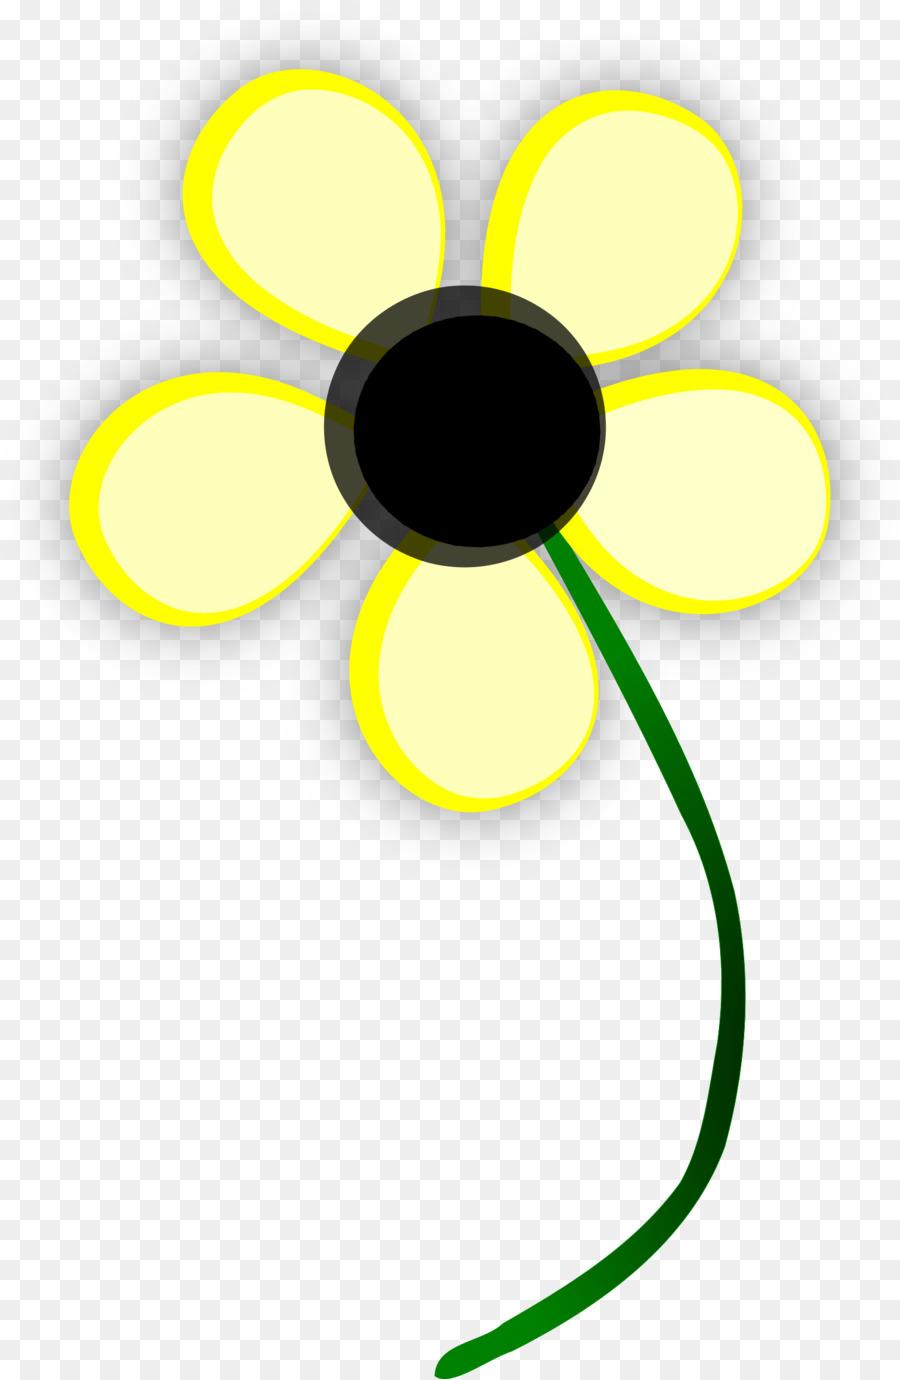 medium resolution of common daisy yellow blackeyed susan flower sunflower png